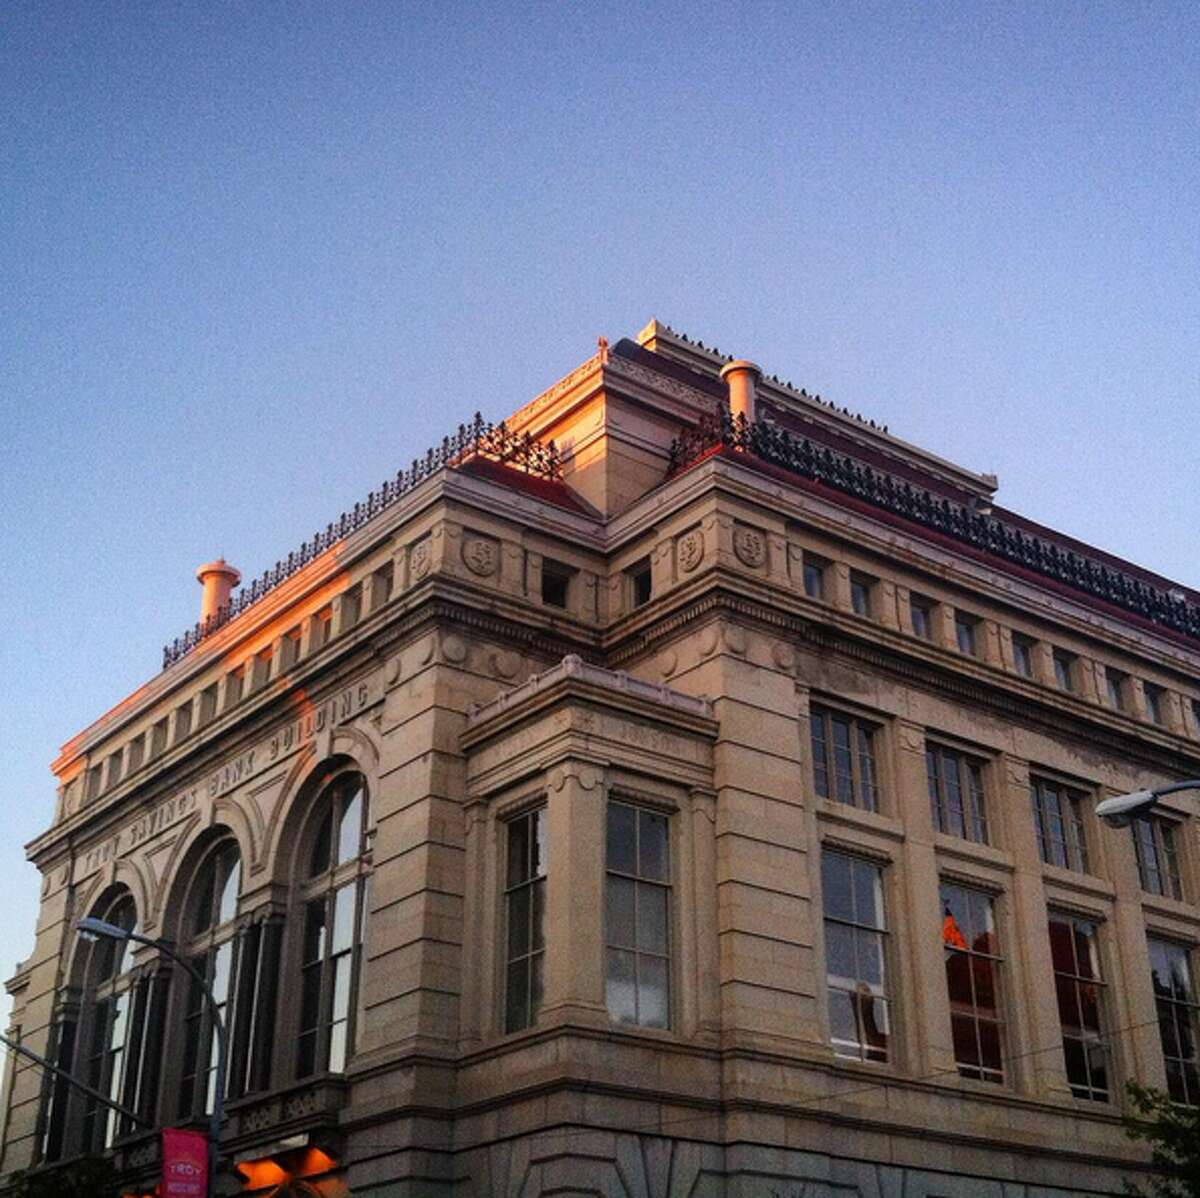 Troy Savings Bank Music Hall, Troy, NY. Photo credit: @amythstldy